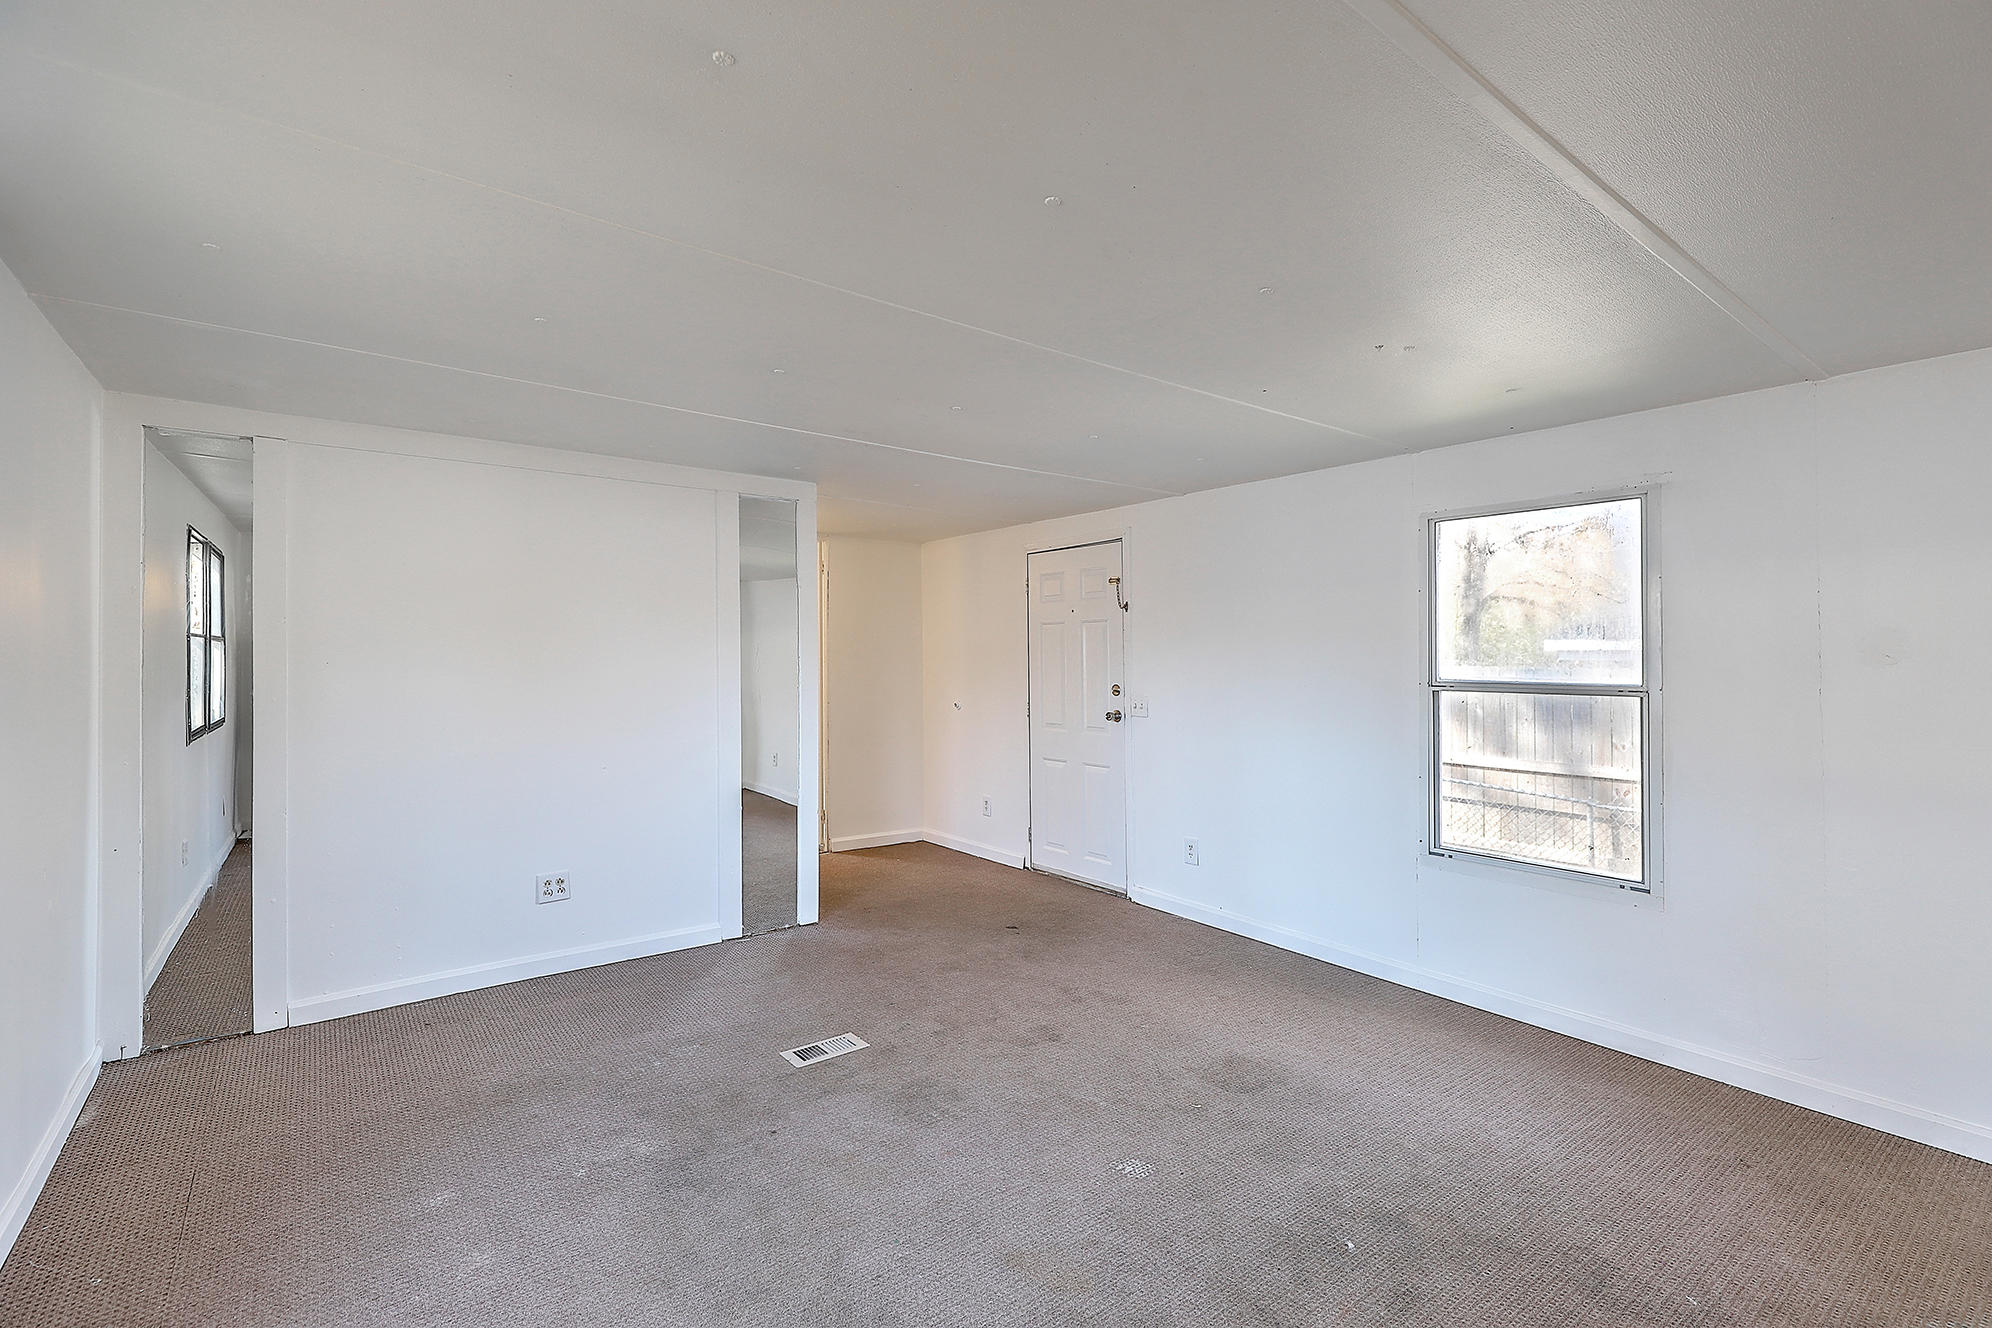 Caromi Village Homes For Sale - 323 Raymond, Ladson, SC - 3